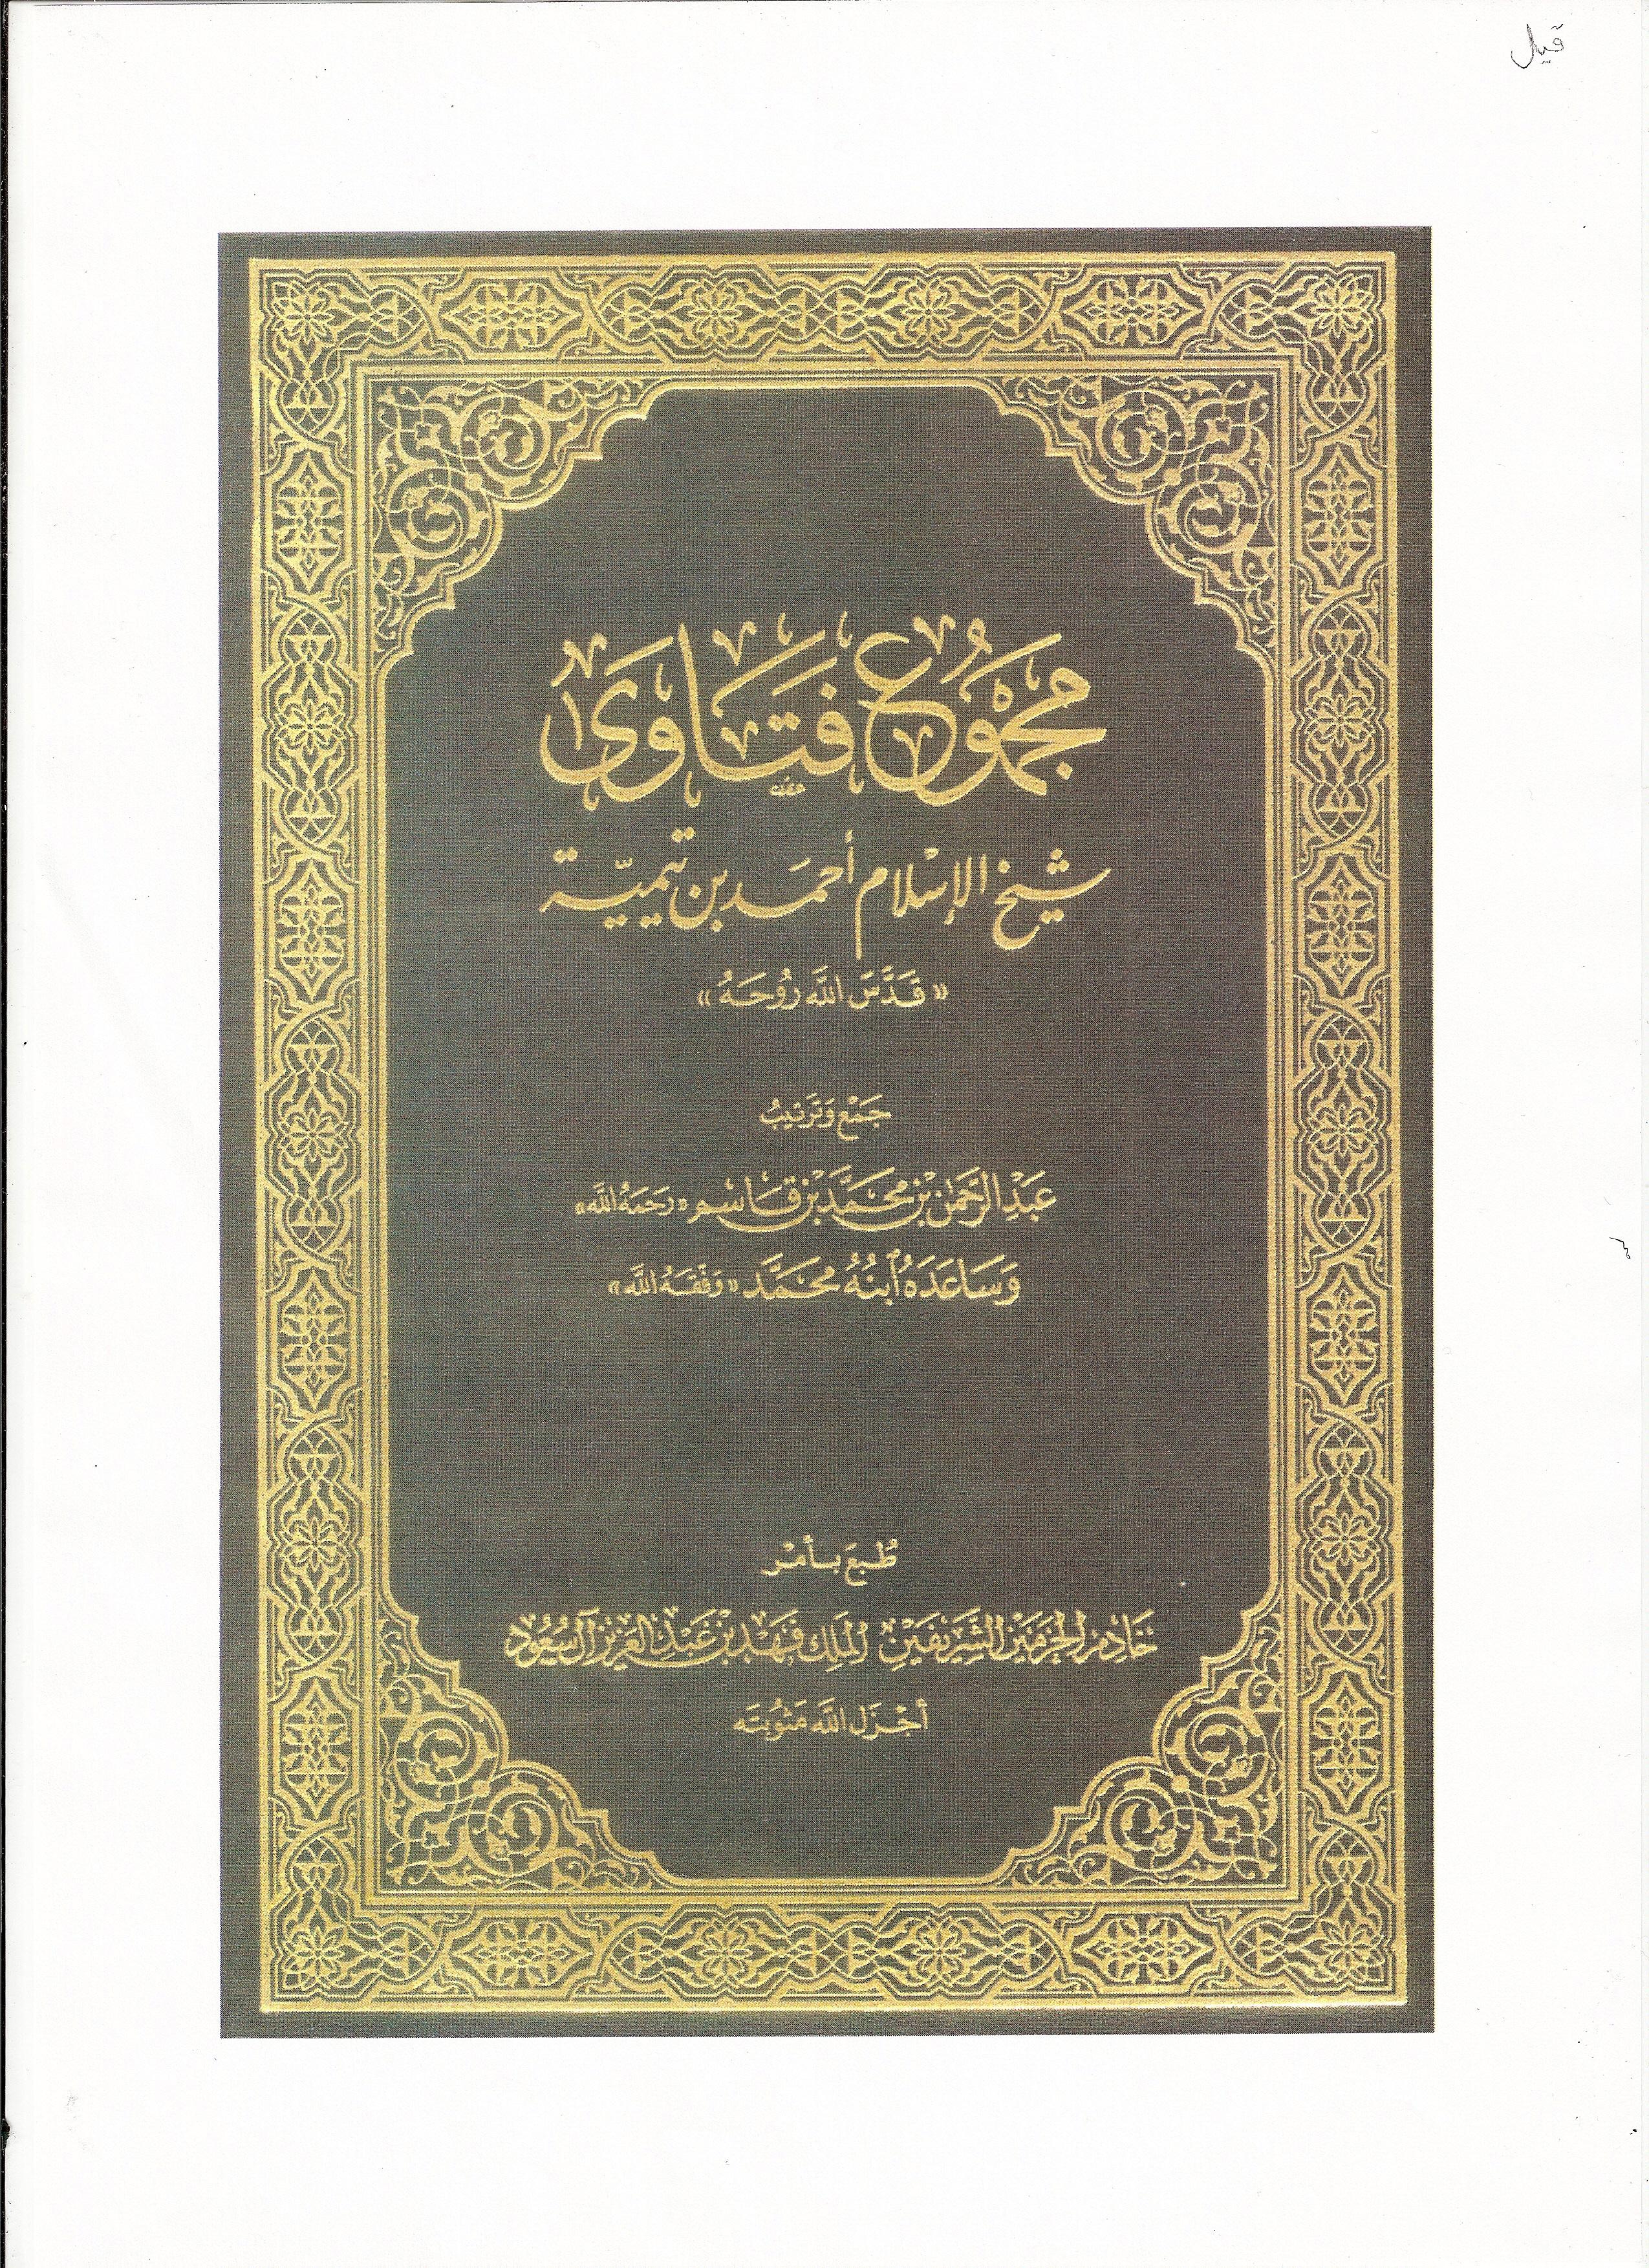 Ibn Taymiyya et les wahhabites interdisent la visite de